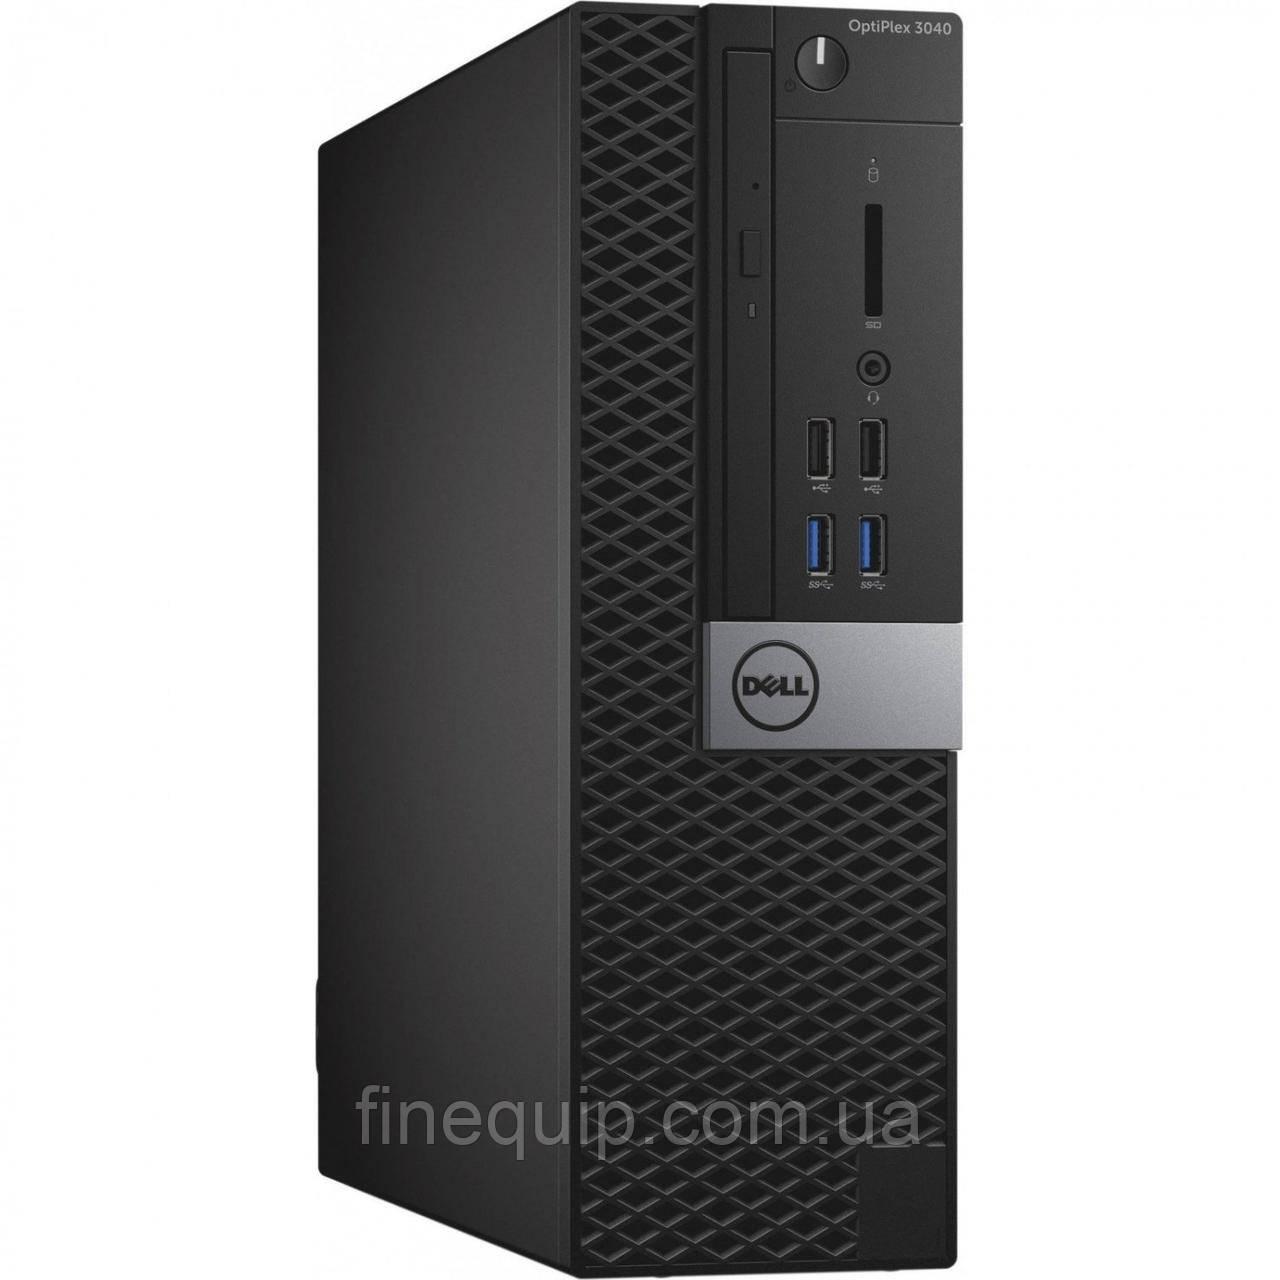 Системний блок Dell Dell Optiplex 3040 SFF-Intel Core-i5-6500-3.2GHz-8Gb-DDR3-HDD-500Gb-DVD-RW-(B)- Б/У